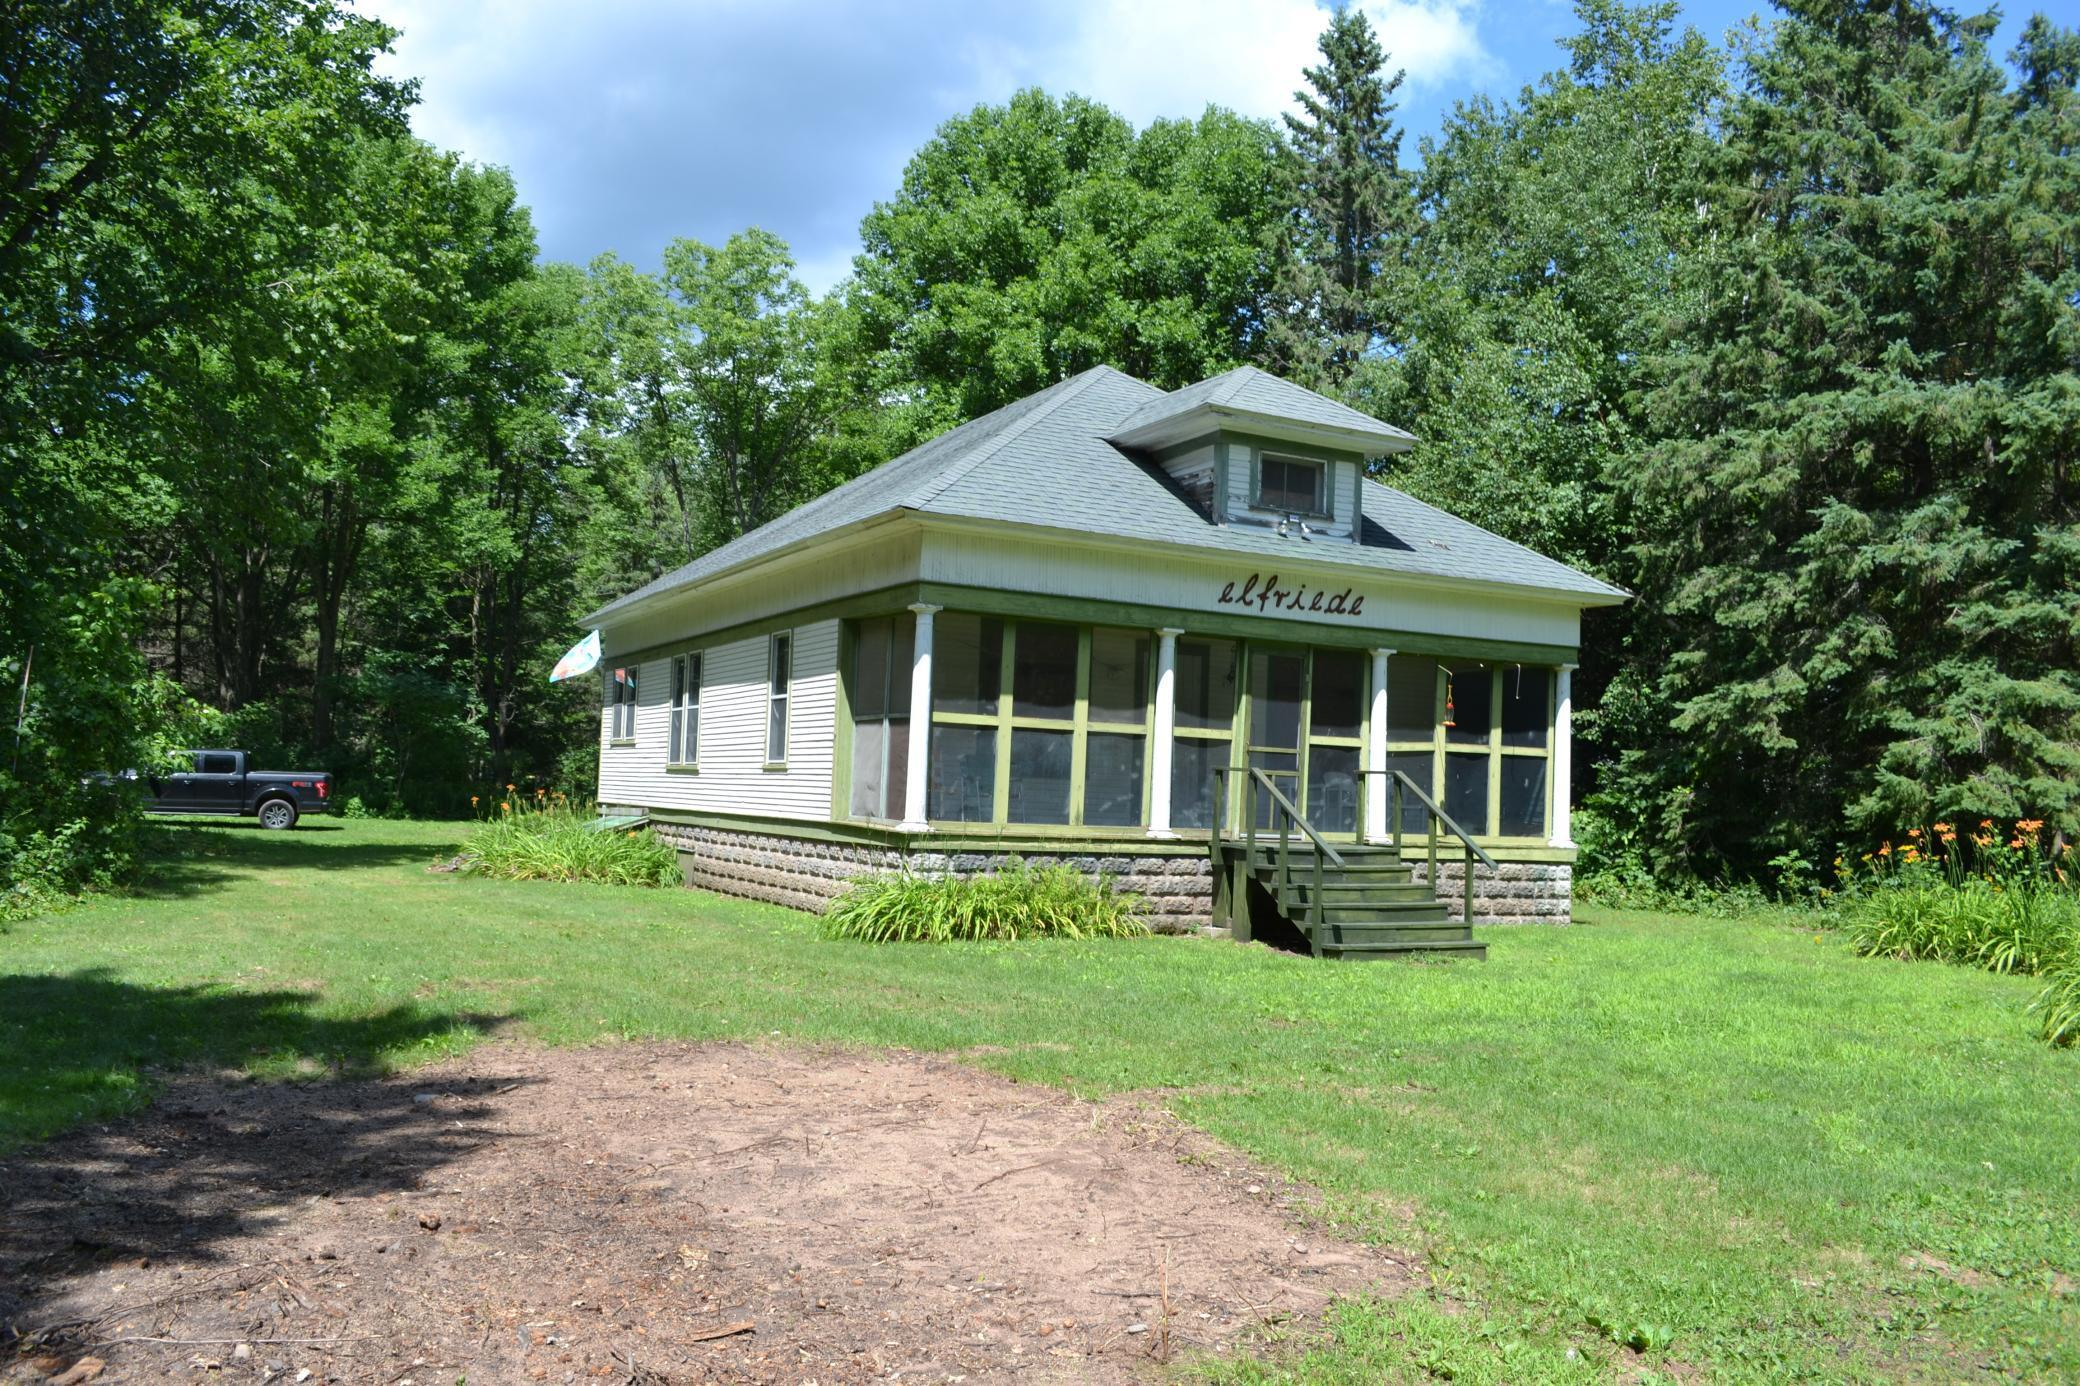 7124 N Thoroughfare Road Property Photo - Bass Lake Twp, WI real estate listing